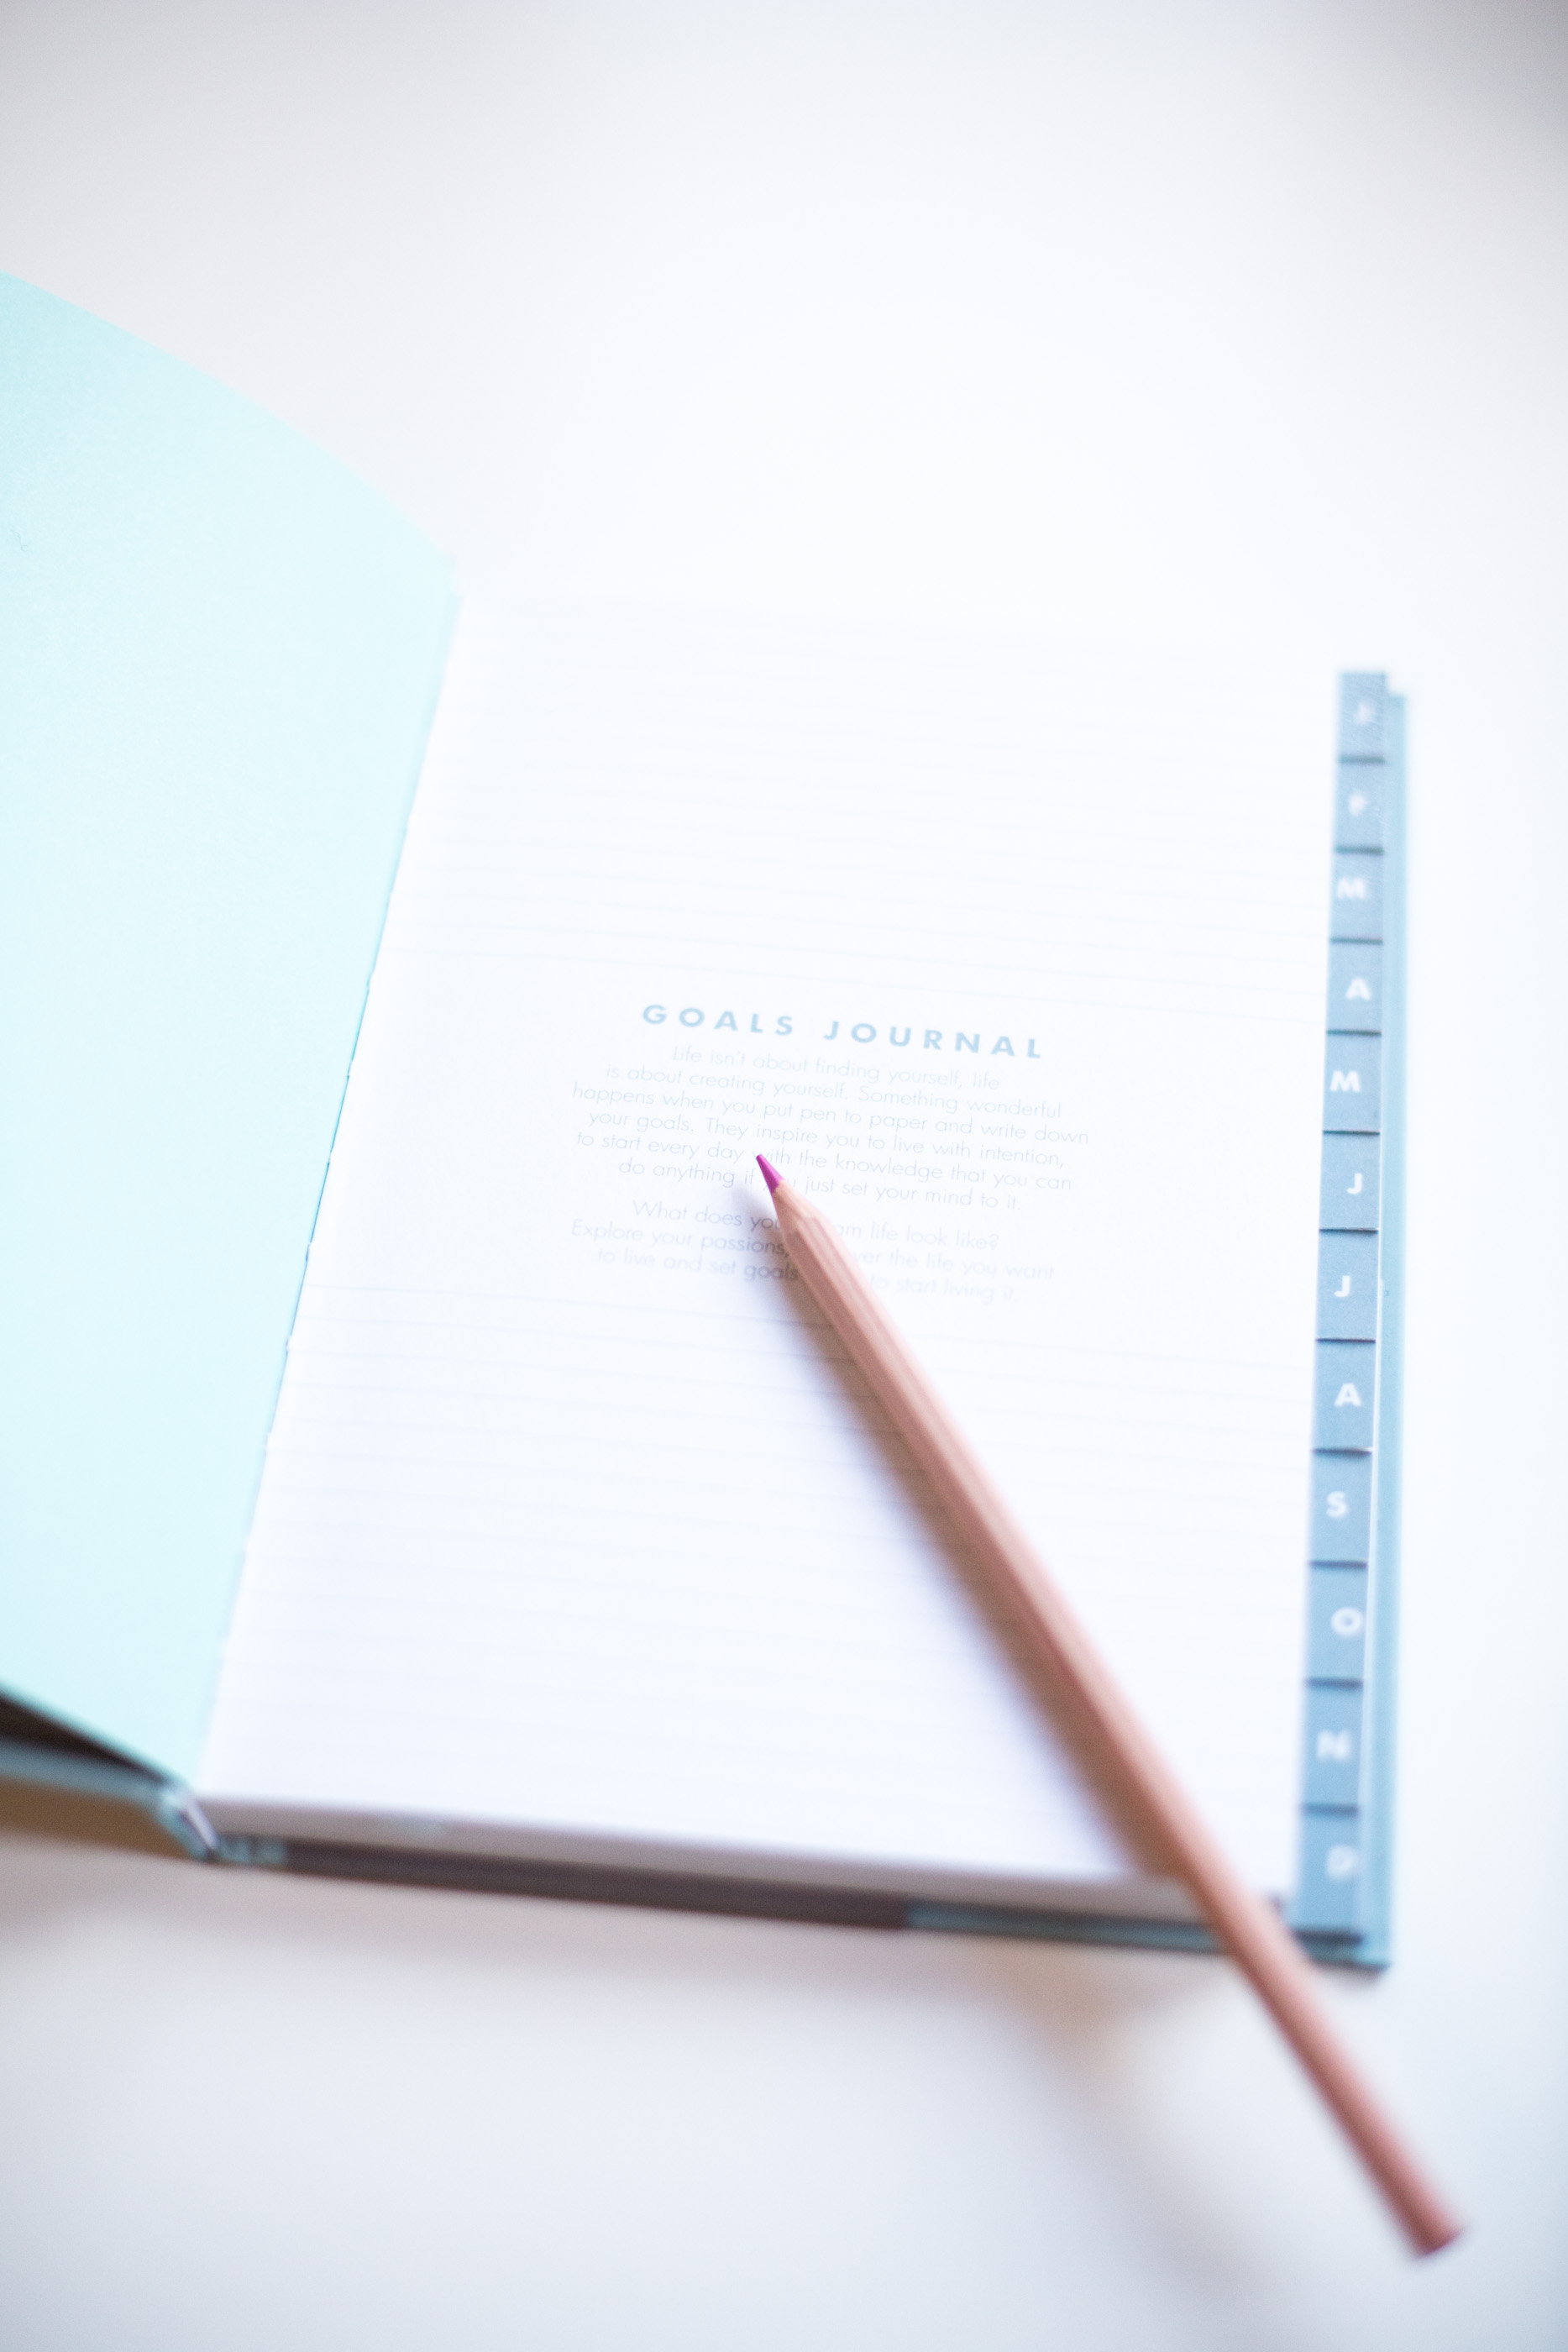 mediamarmalade blogging tips